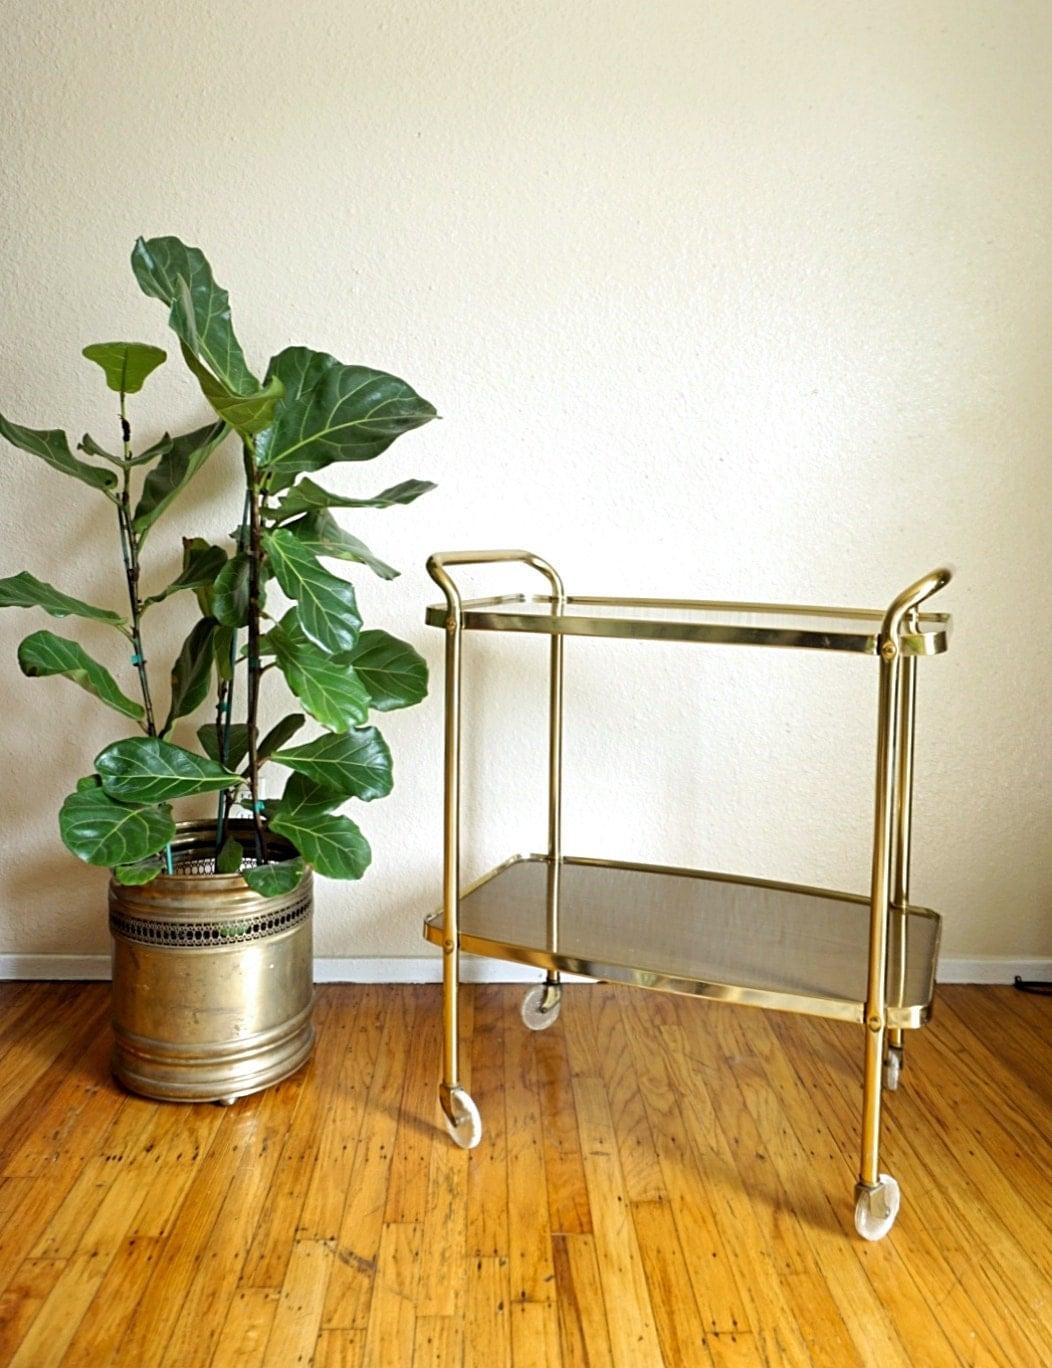 The Cosco Bar Cart